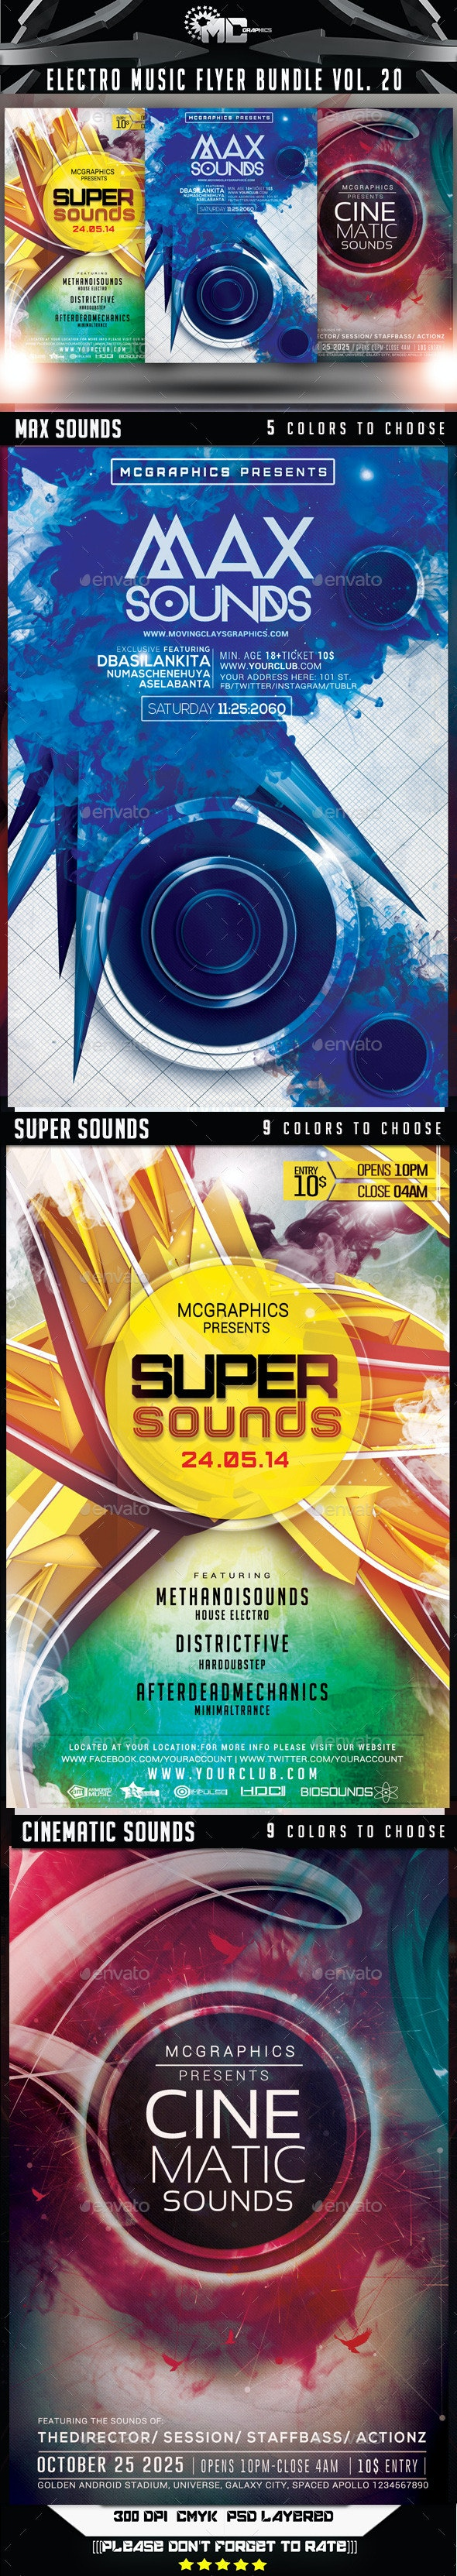 Electro Music Flyer Bundle Vol. 20 - Flyers Print Templates